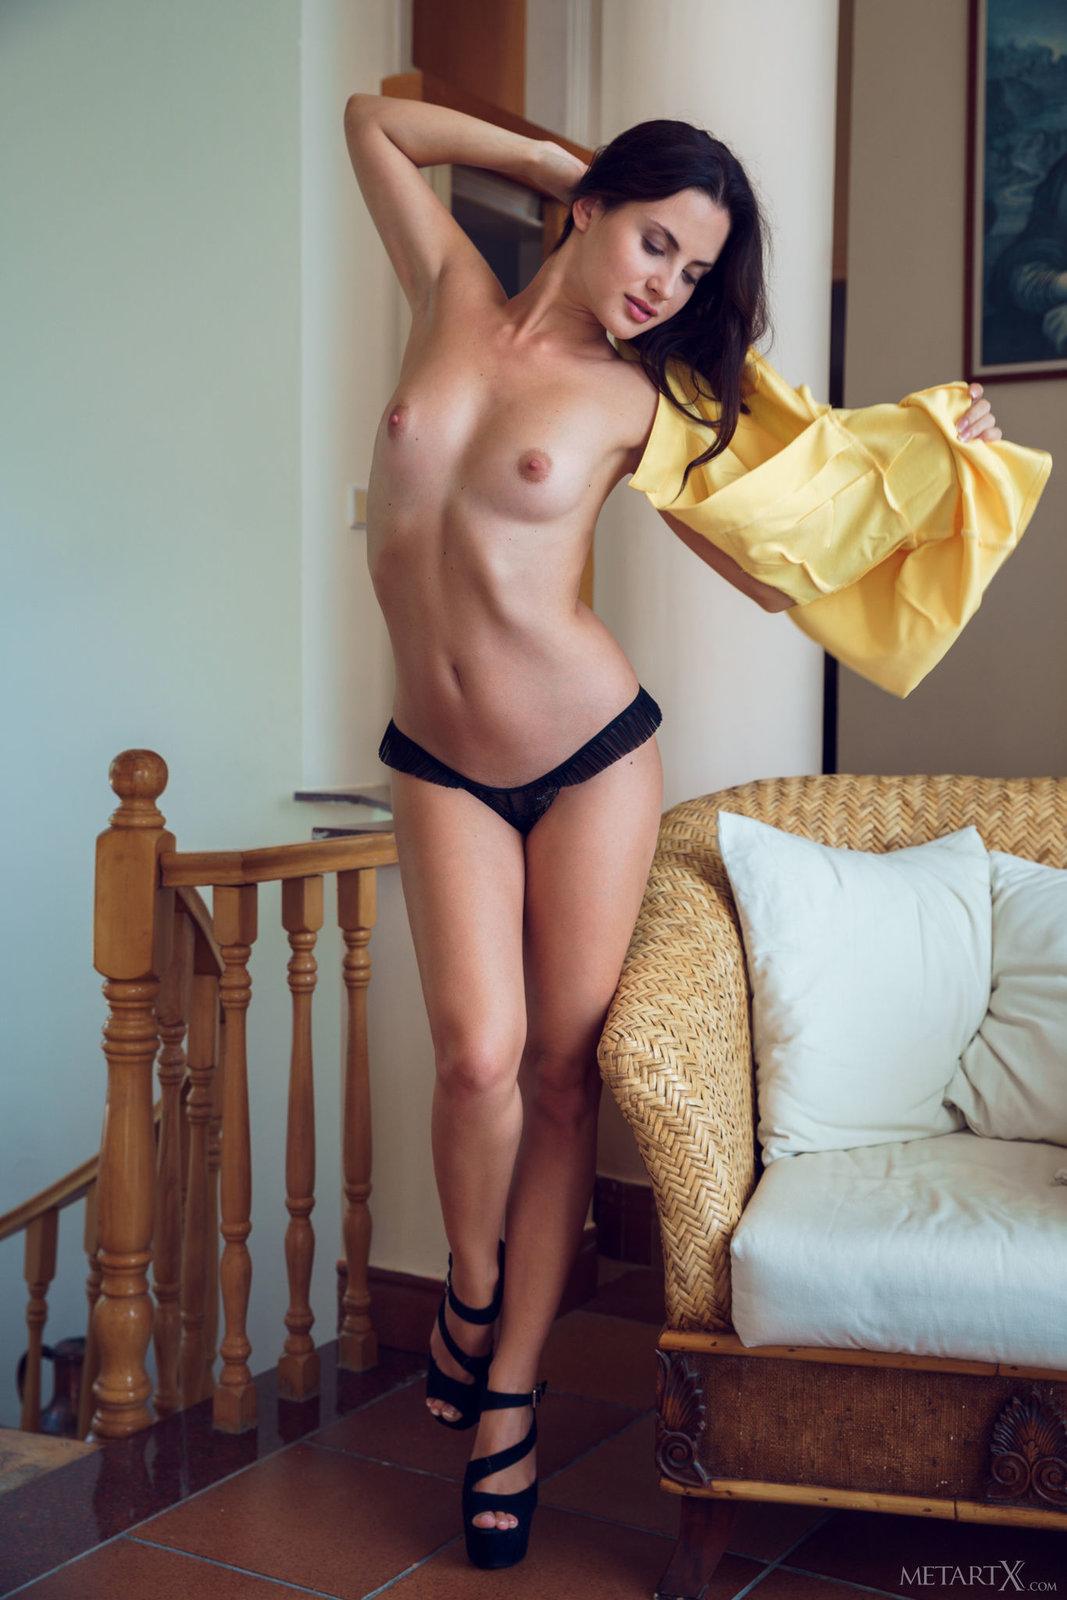 foto-erotika-bryunetka-snimaet-plate-seks-vecherinka-svingerov-foto